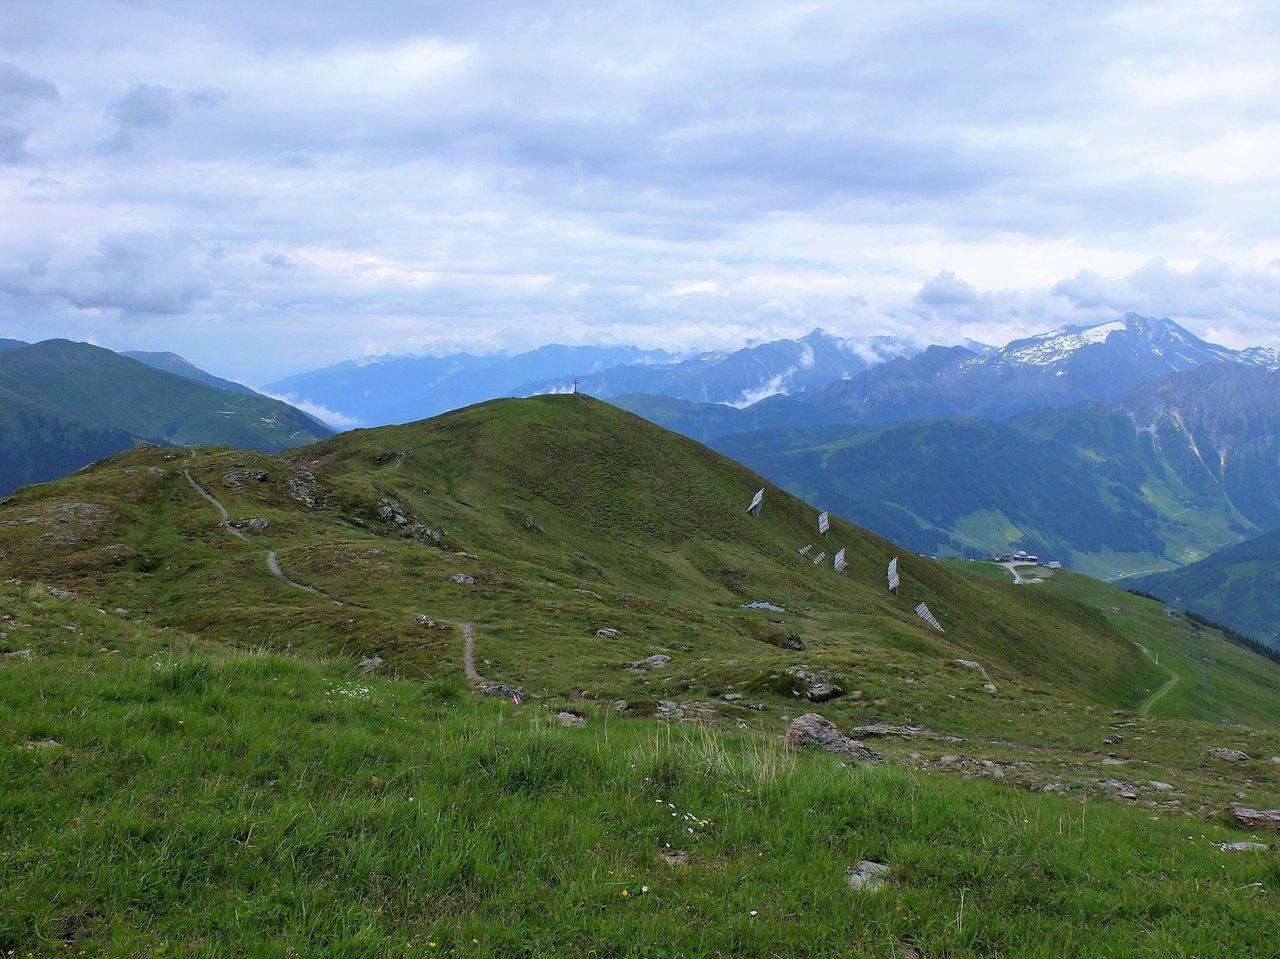 Mountainbike-Touren in Baden-W rttemberg